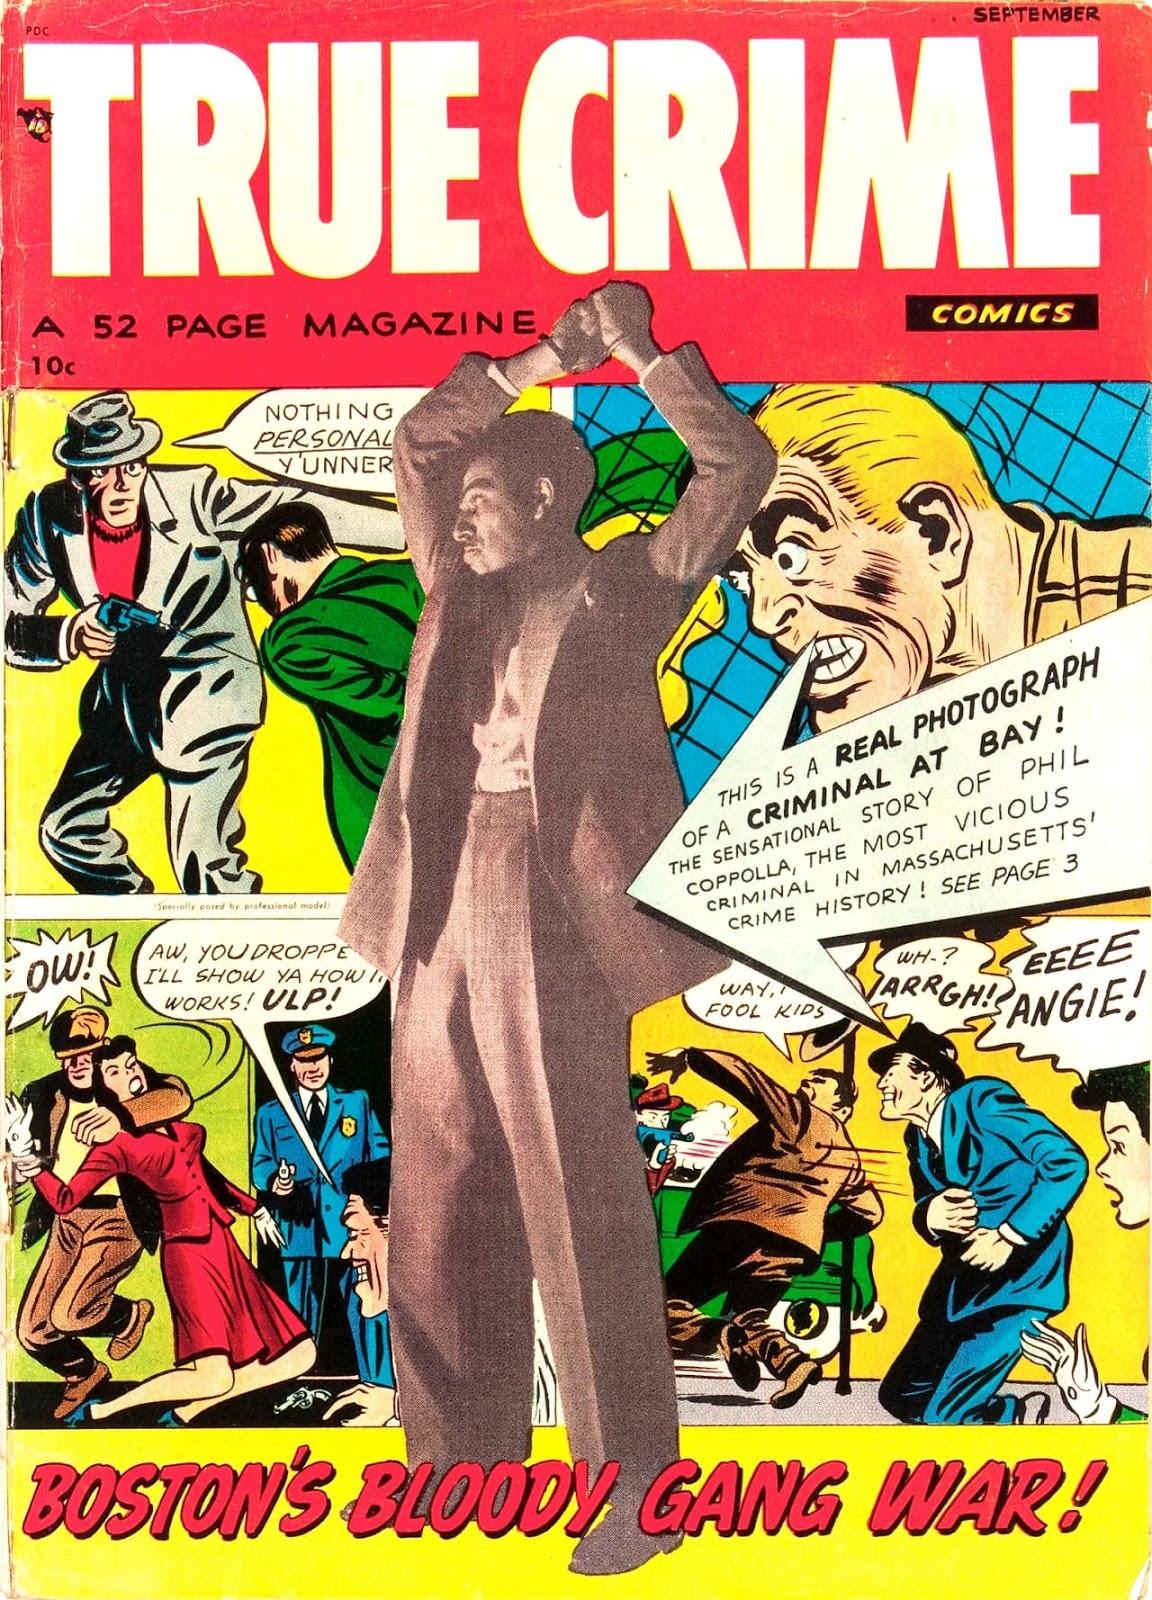 True Crime Comics #1 golden age 1940s comic book cover